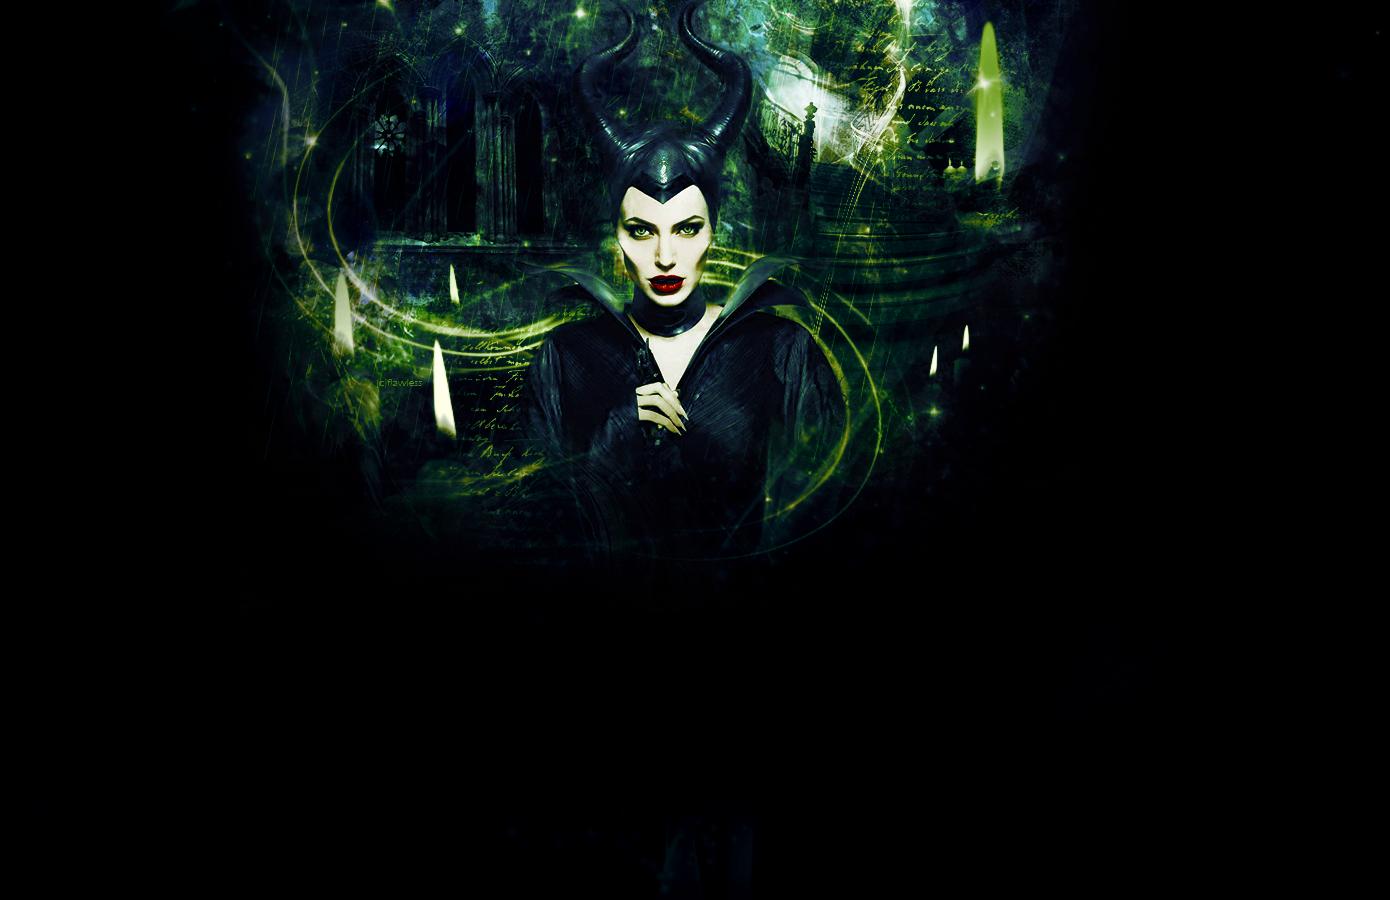 http://flawlessgrafic.deviantart.com/art/maleficent-by-Flawless-479614177?q=gallery%3Aflawlessgrafic%2F50484536&qo=2